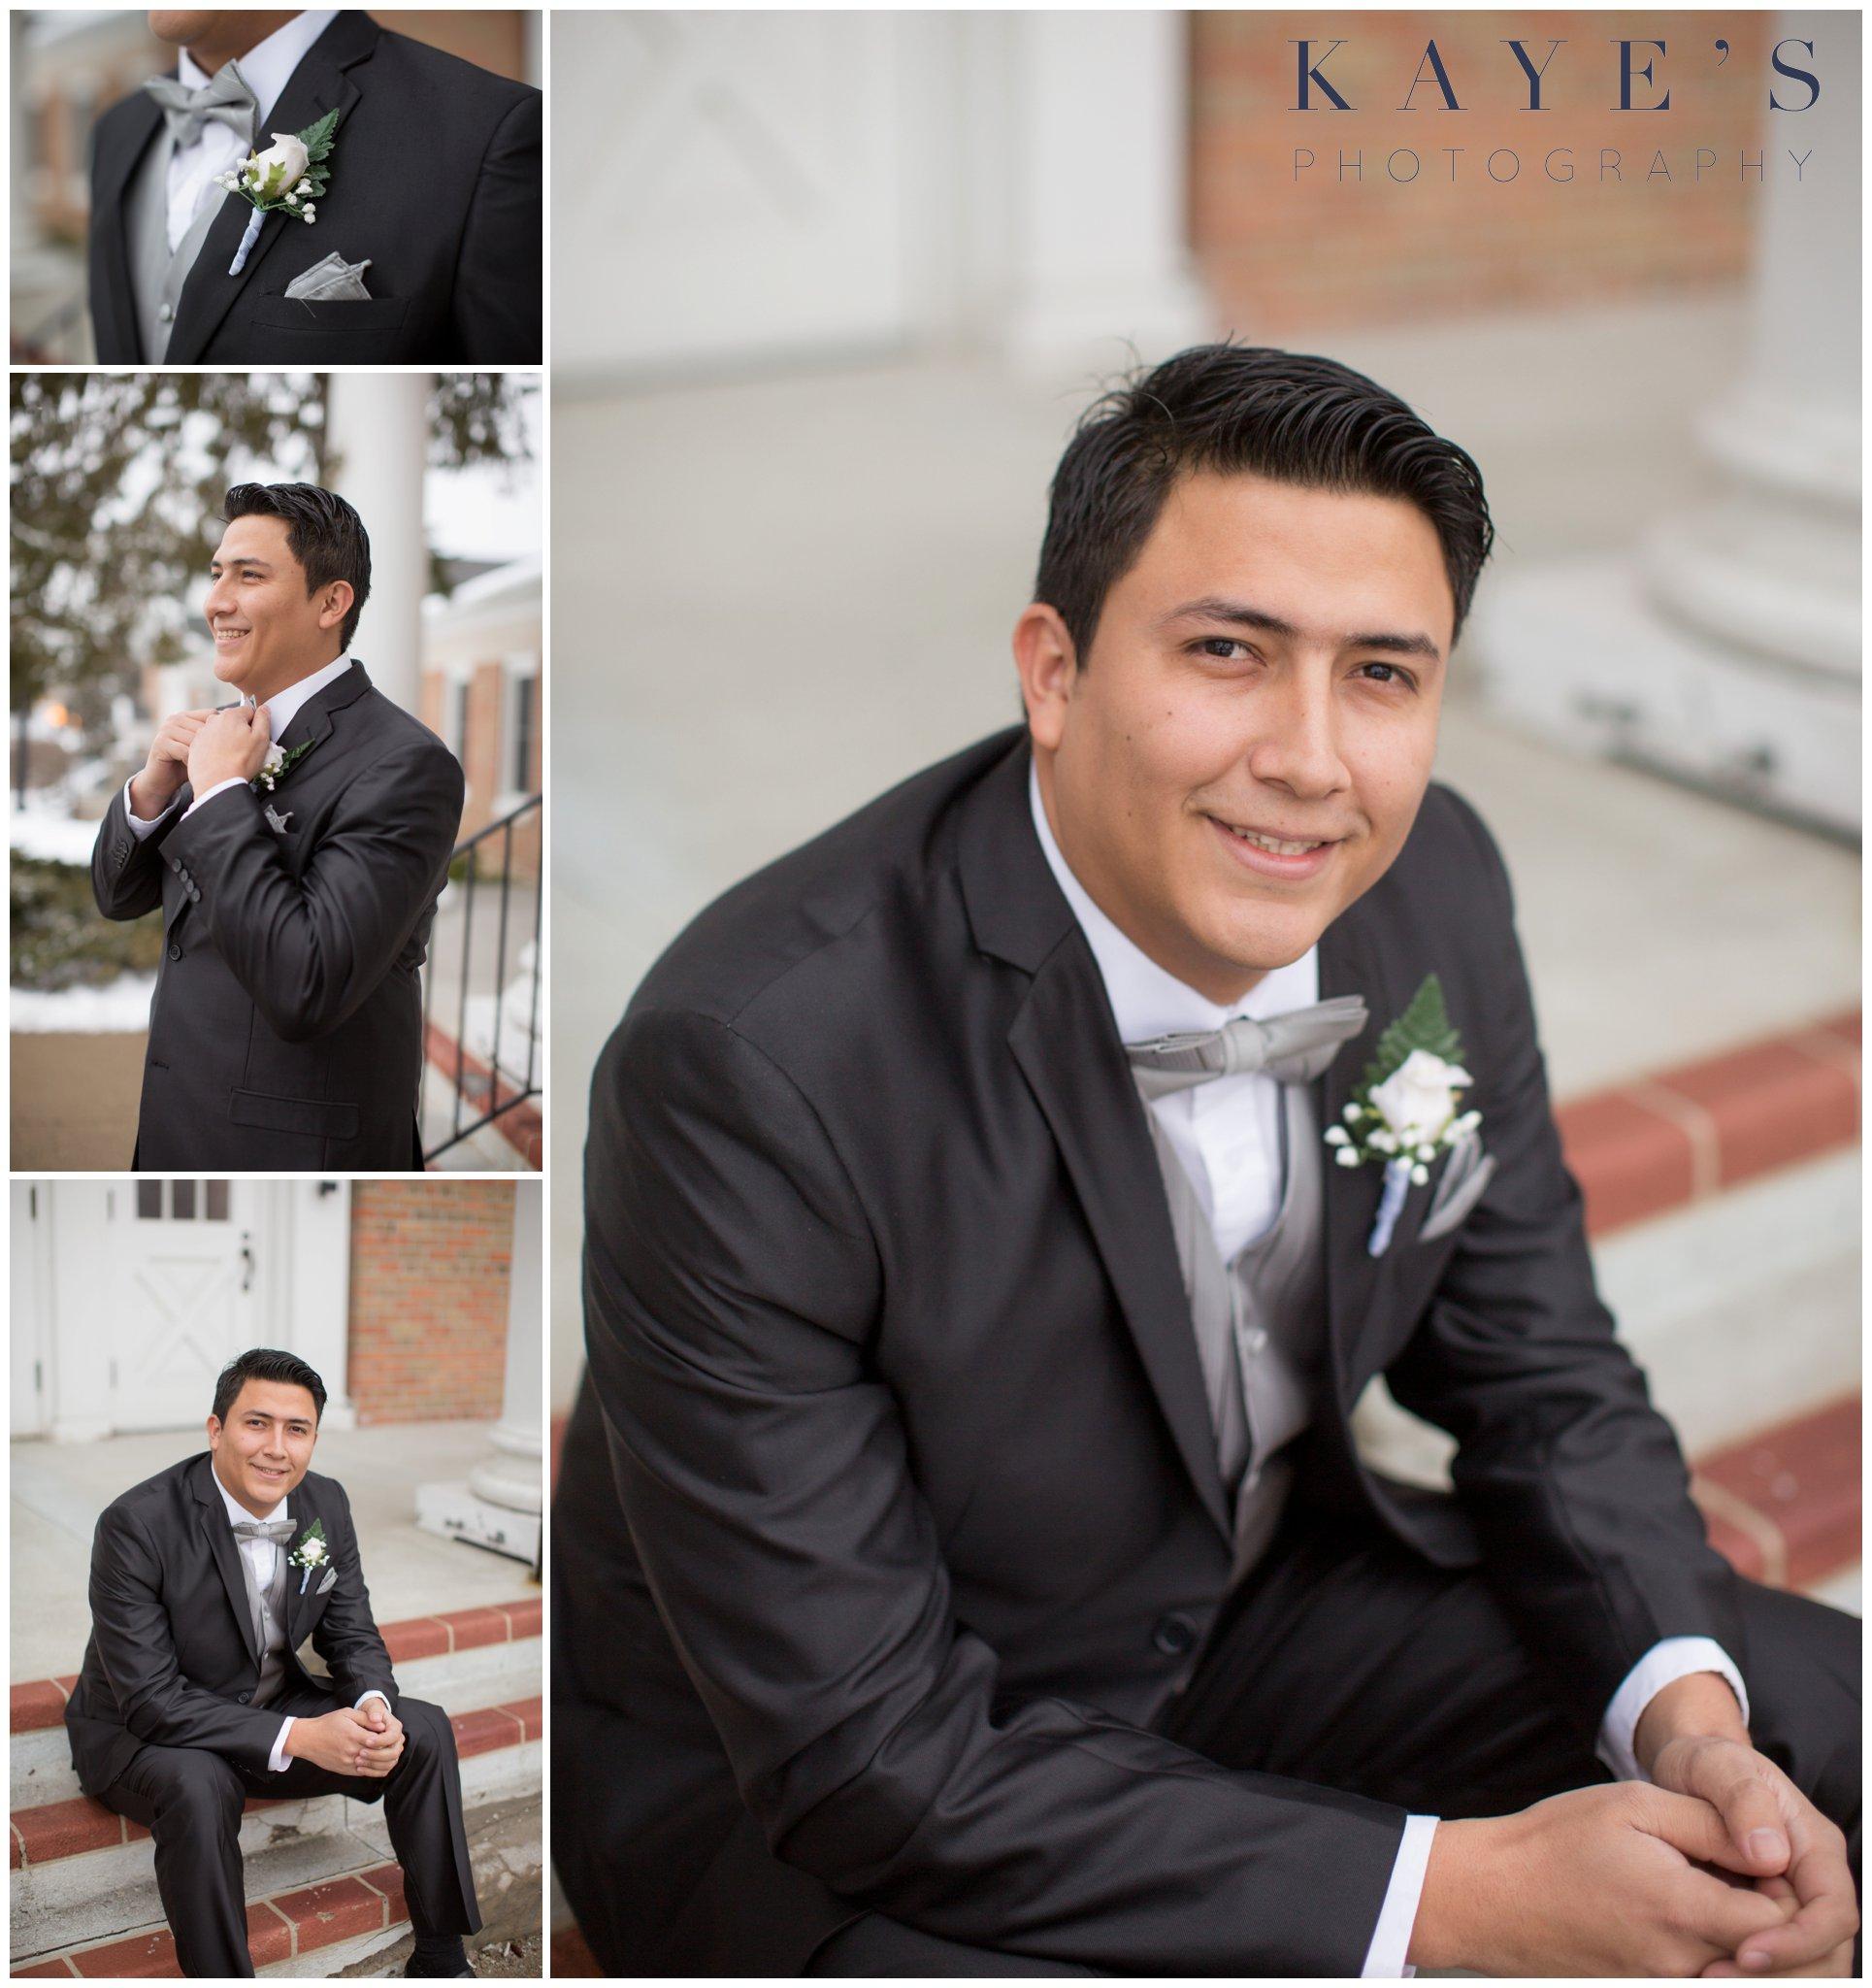 groom details, groom by himself, groom alone, just the groom, groom on steps, clarkston wedding ideas, clarkston wedding photography, clarkston wedding photographer ideas